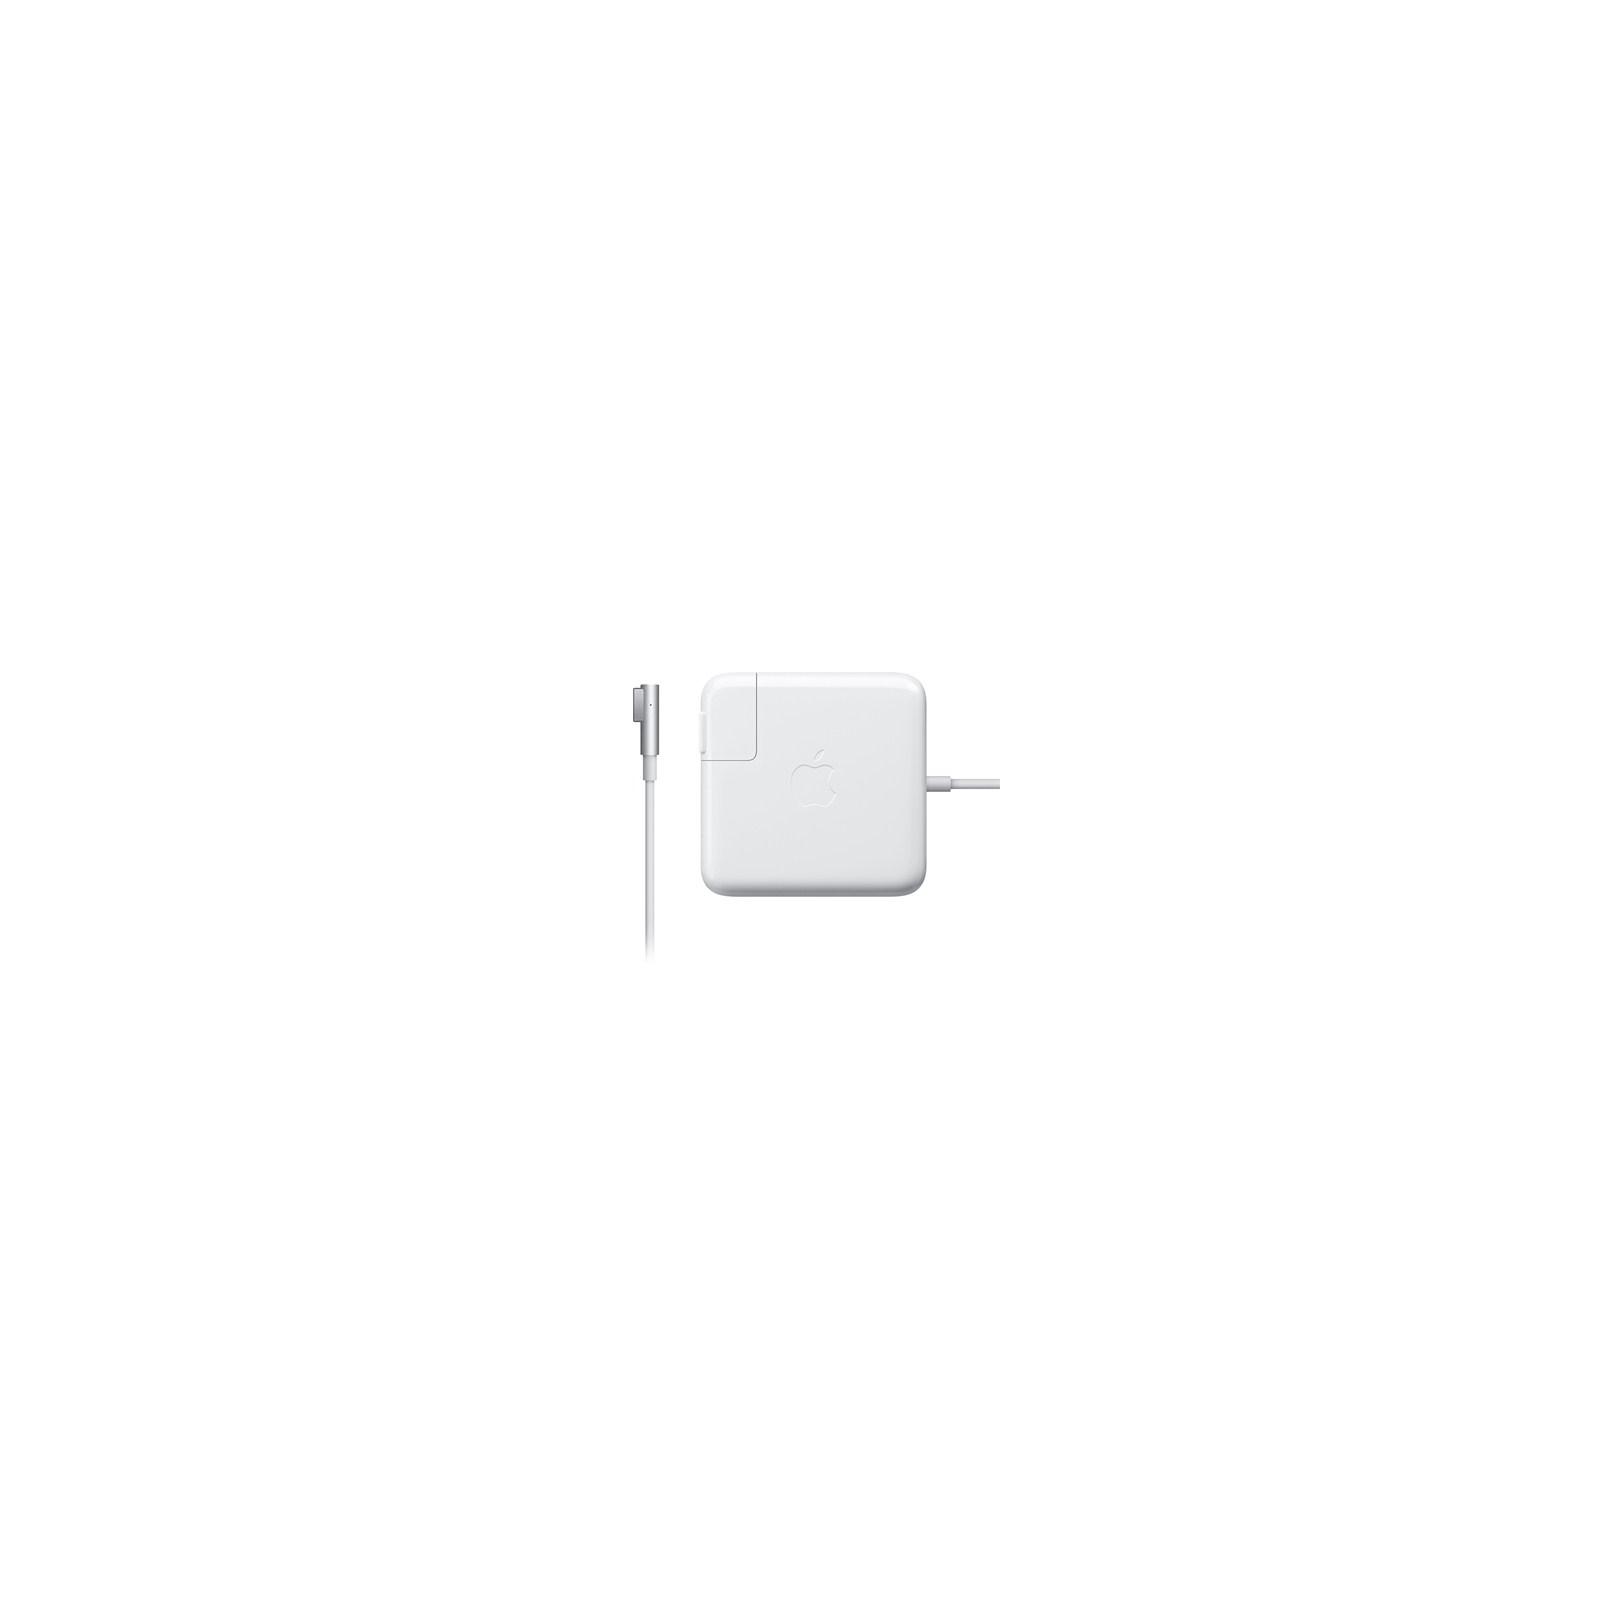 Блок питания к ноутбуку 45W MagSafe Power Adapter Apple (MC747Z/A)